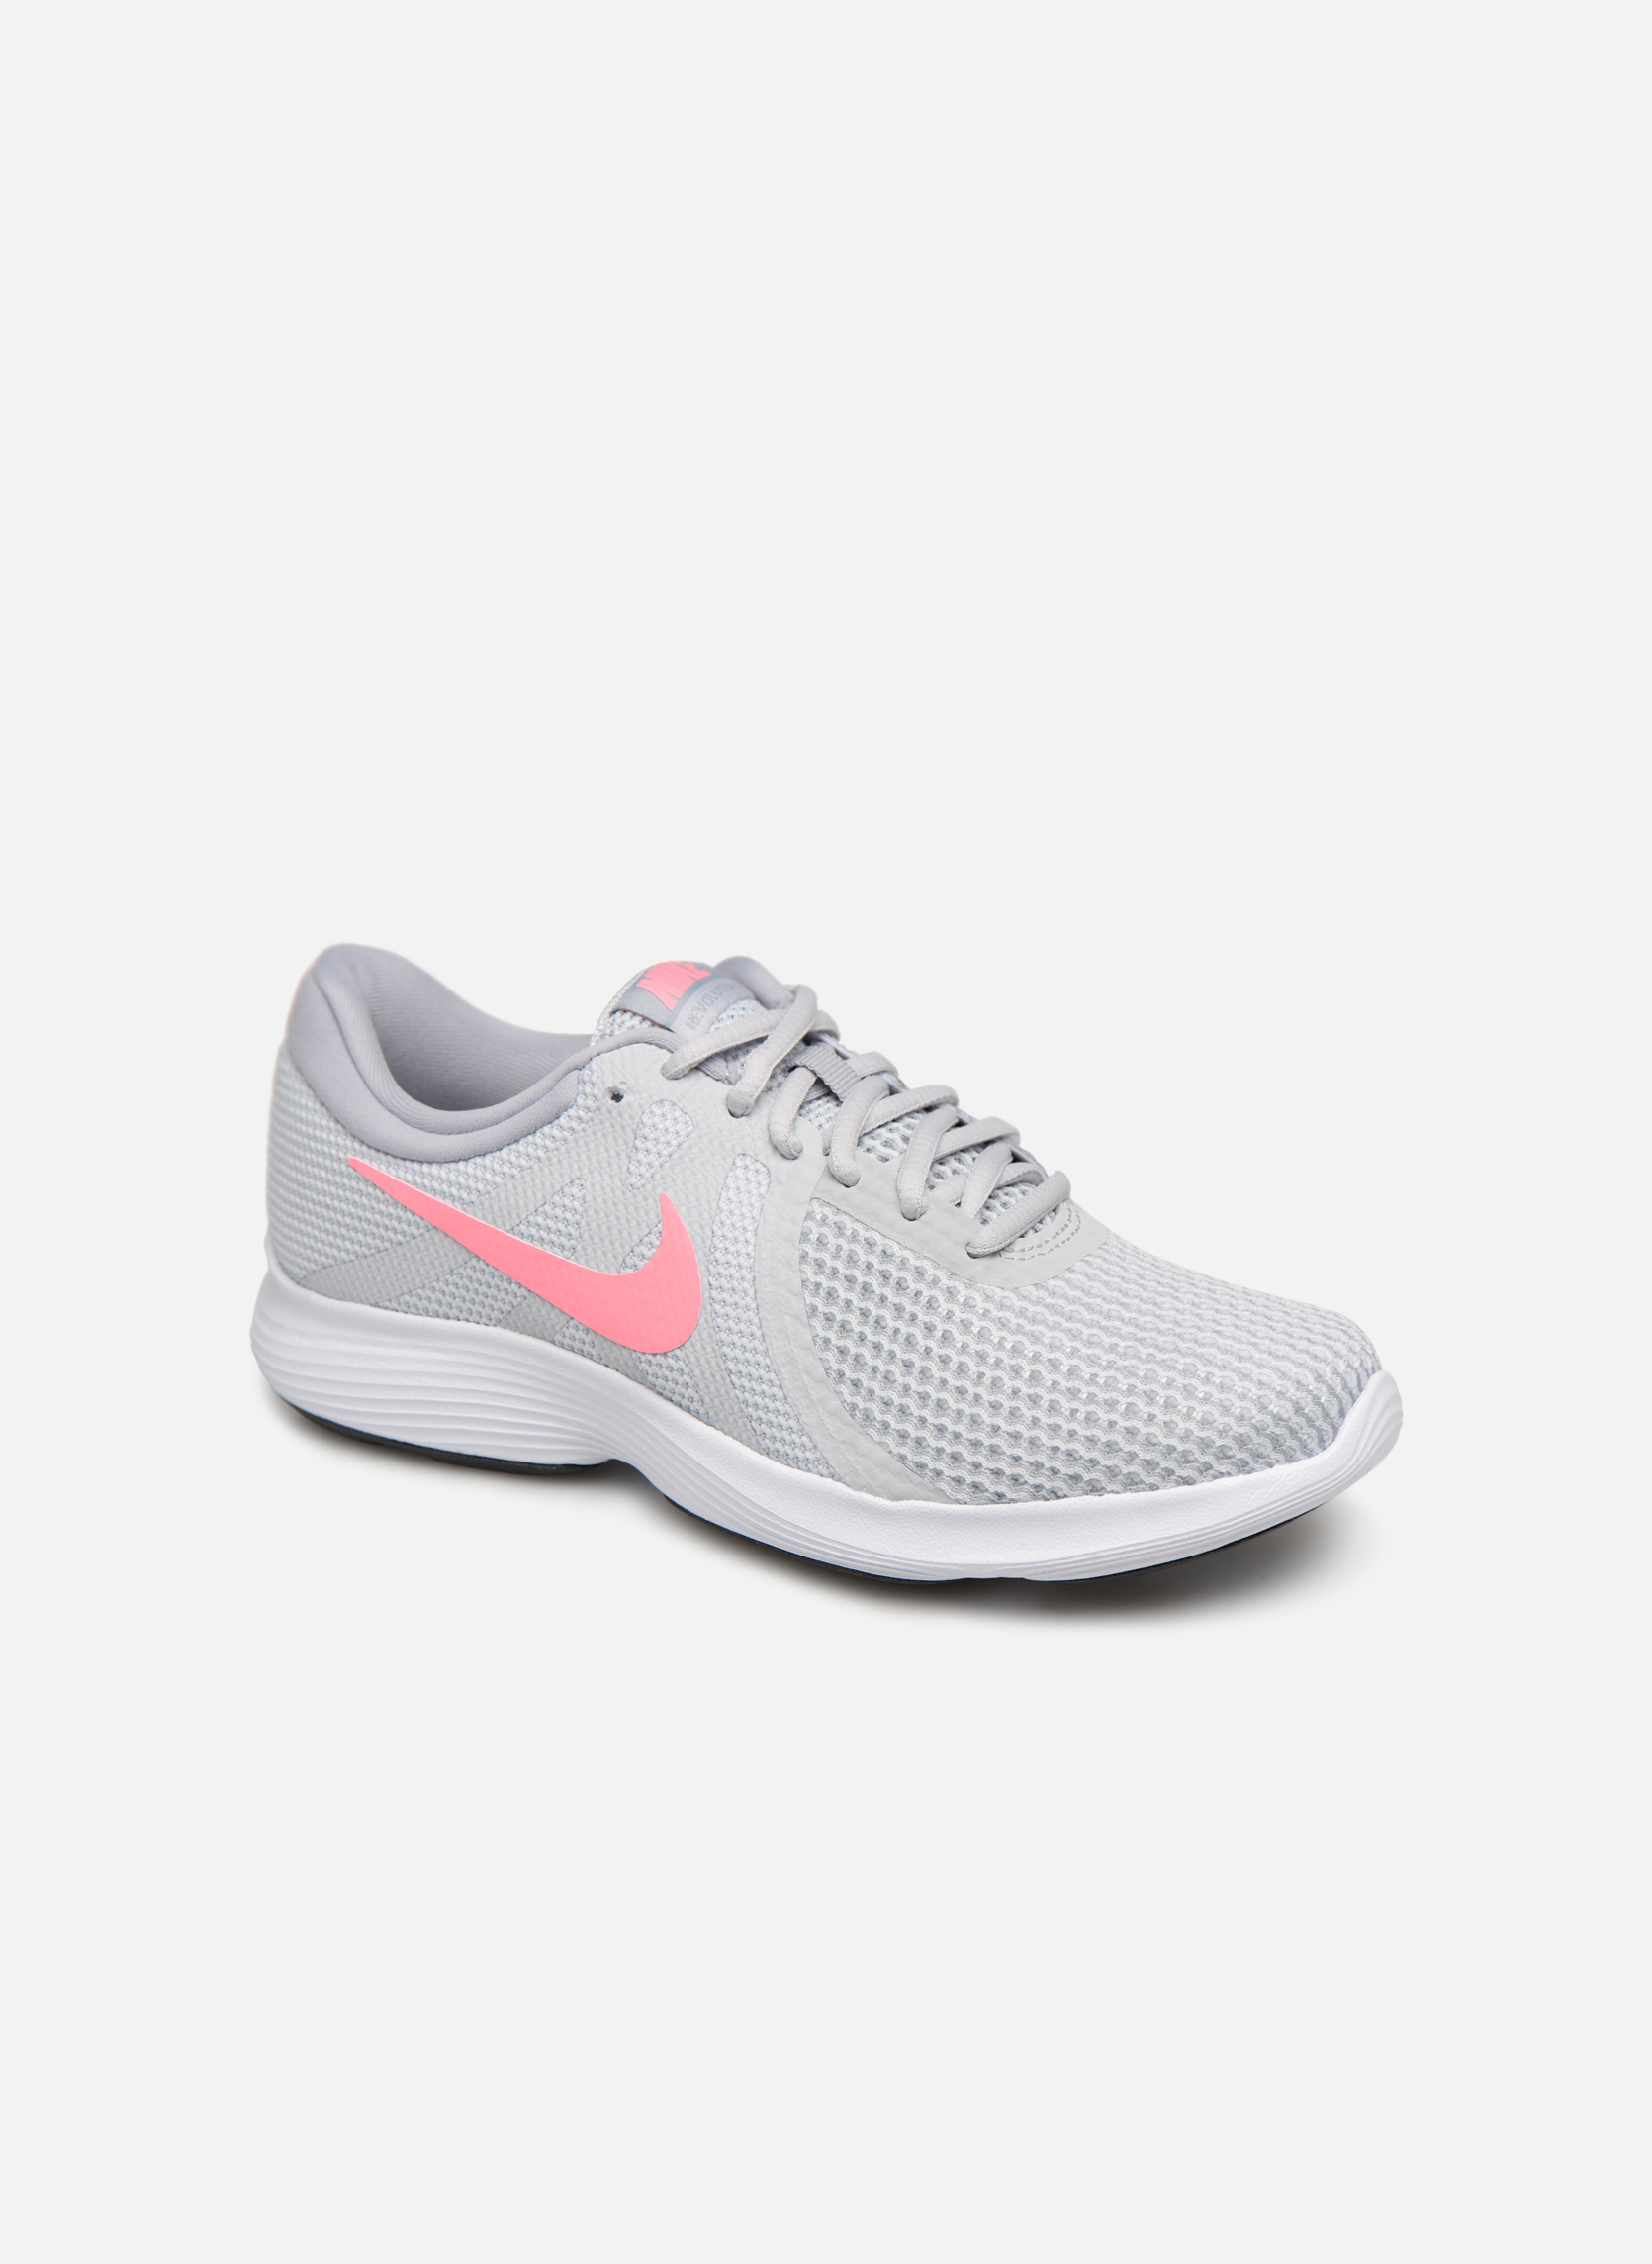 cbea7e4944b Precios de Nike Revolution 4 talla 37.5 baratas - Ofertas para ...